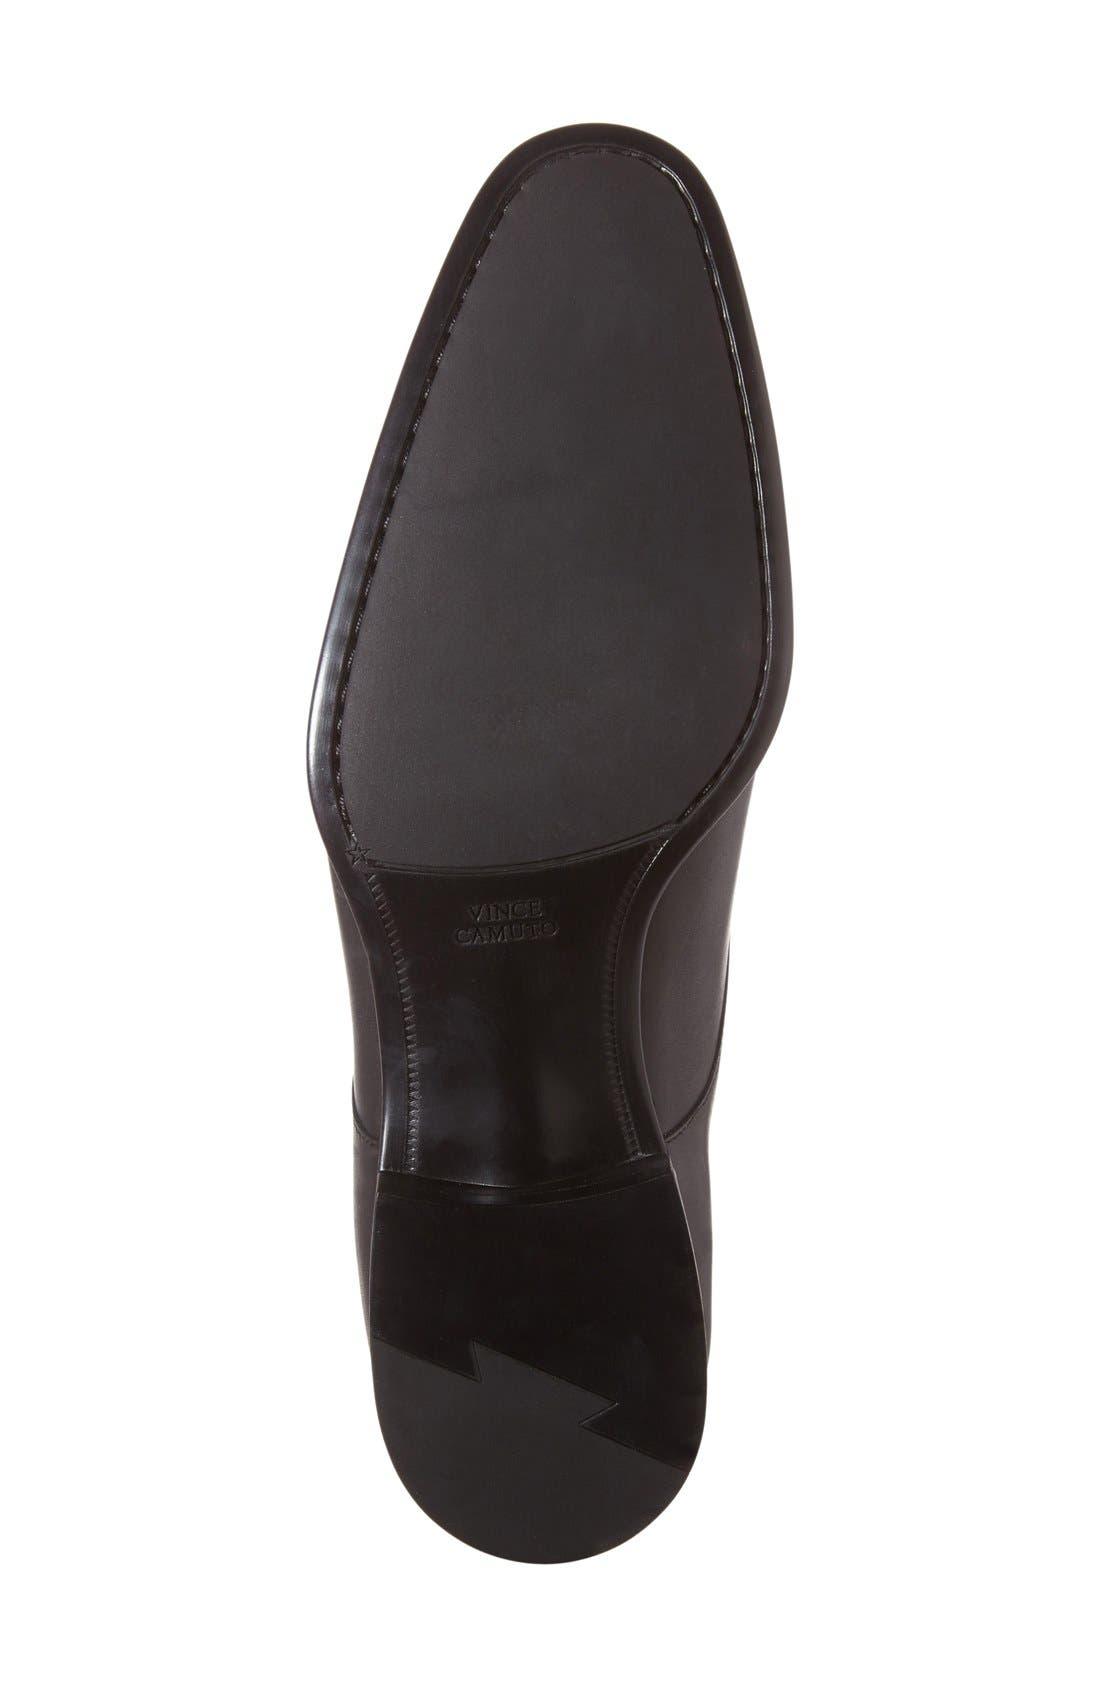 VINCE CAMUTO, 'Trifolo' Monk Strap Shoe, Alternate thumbnail 5, color, 001